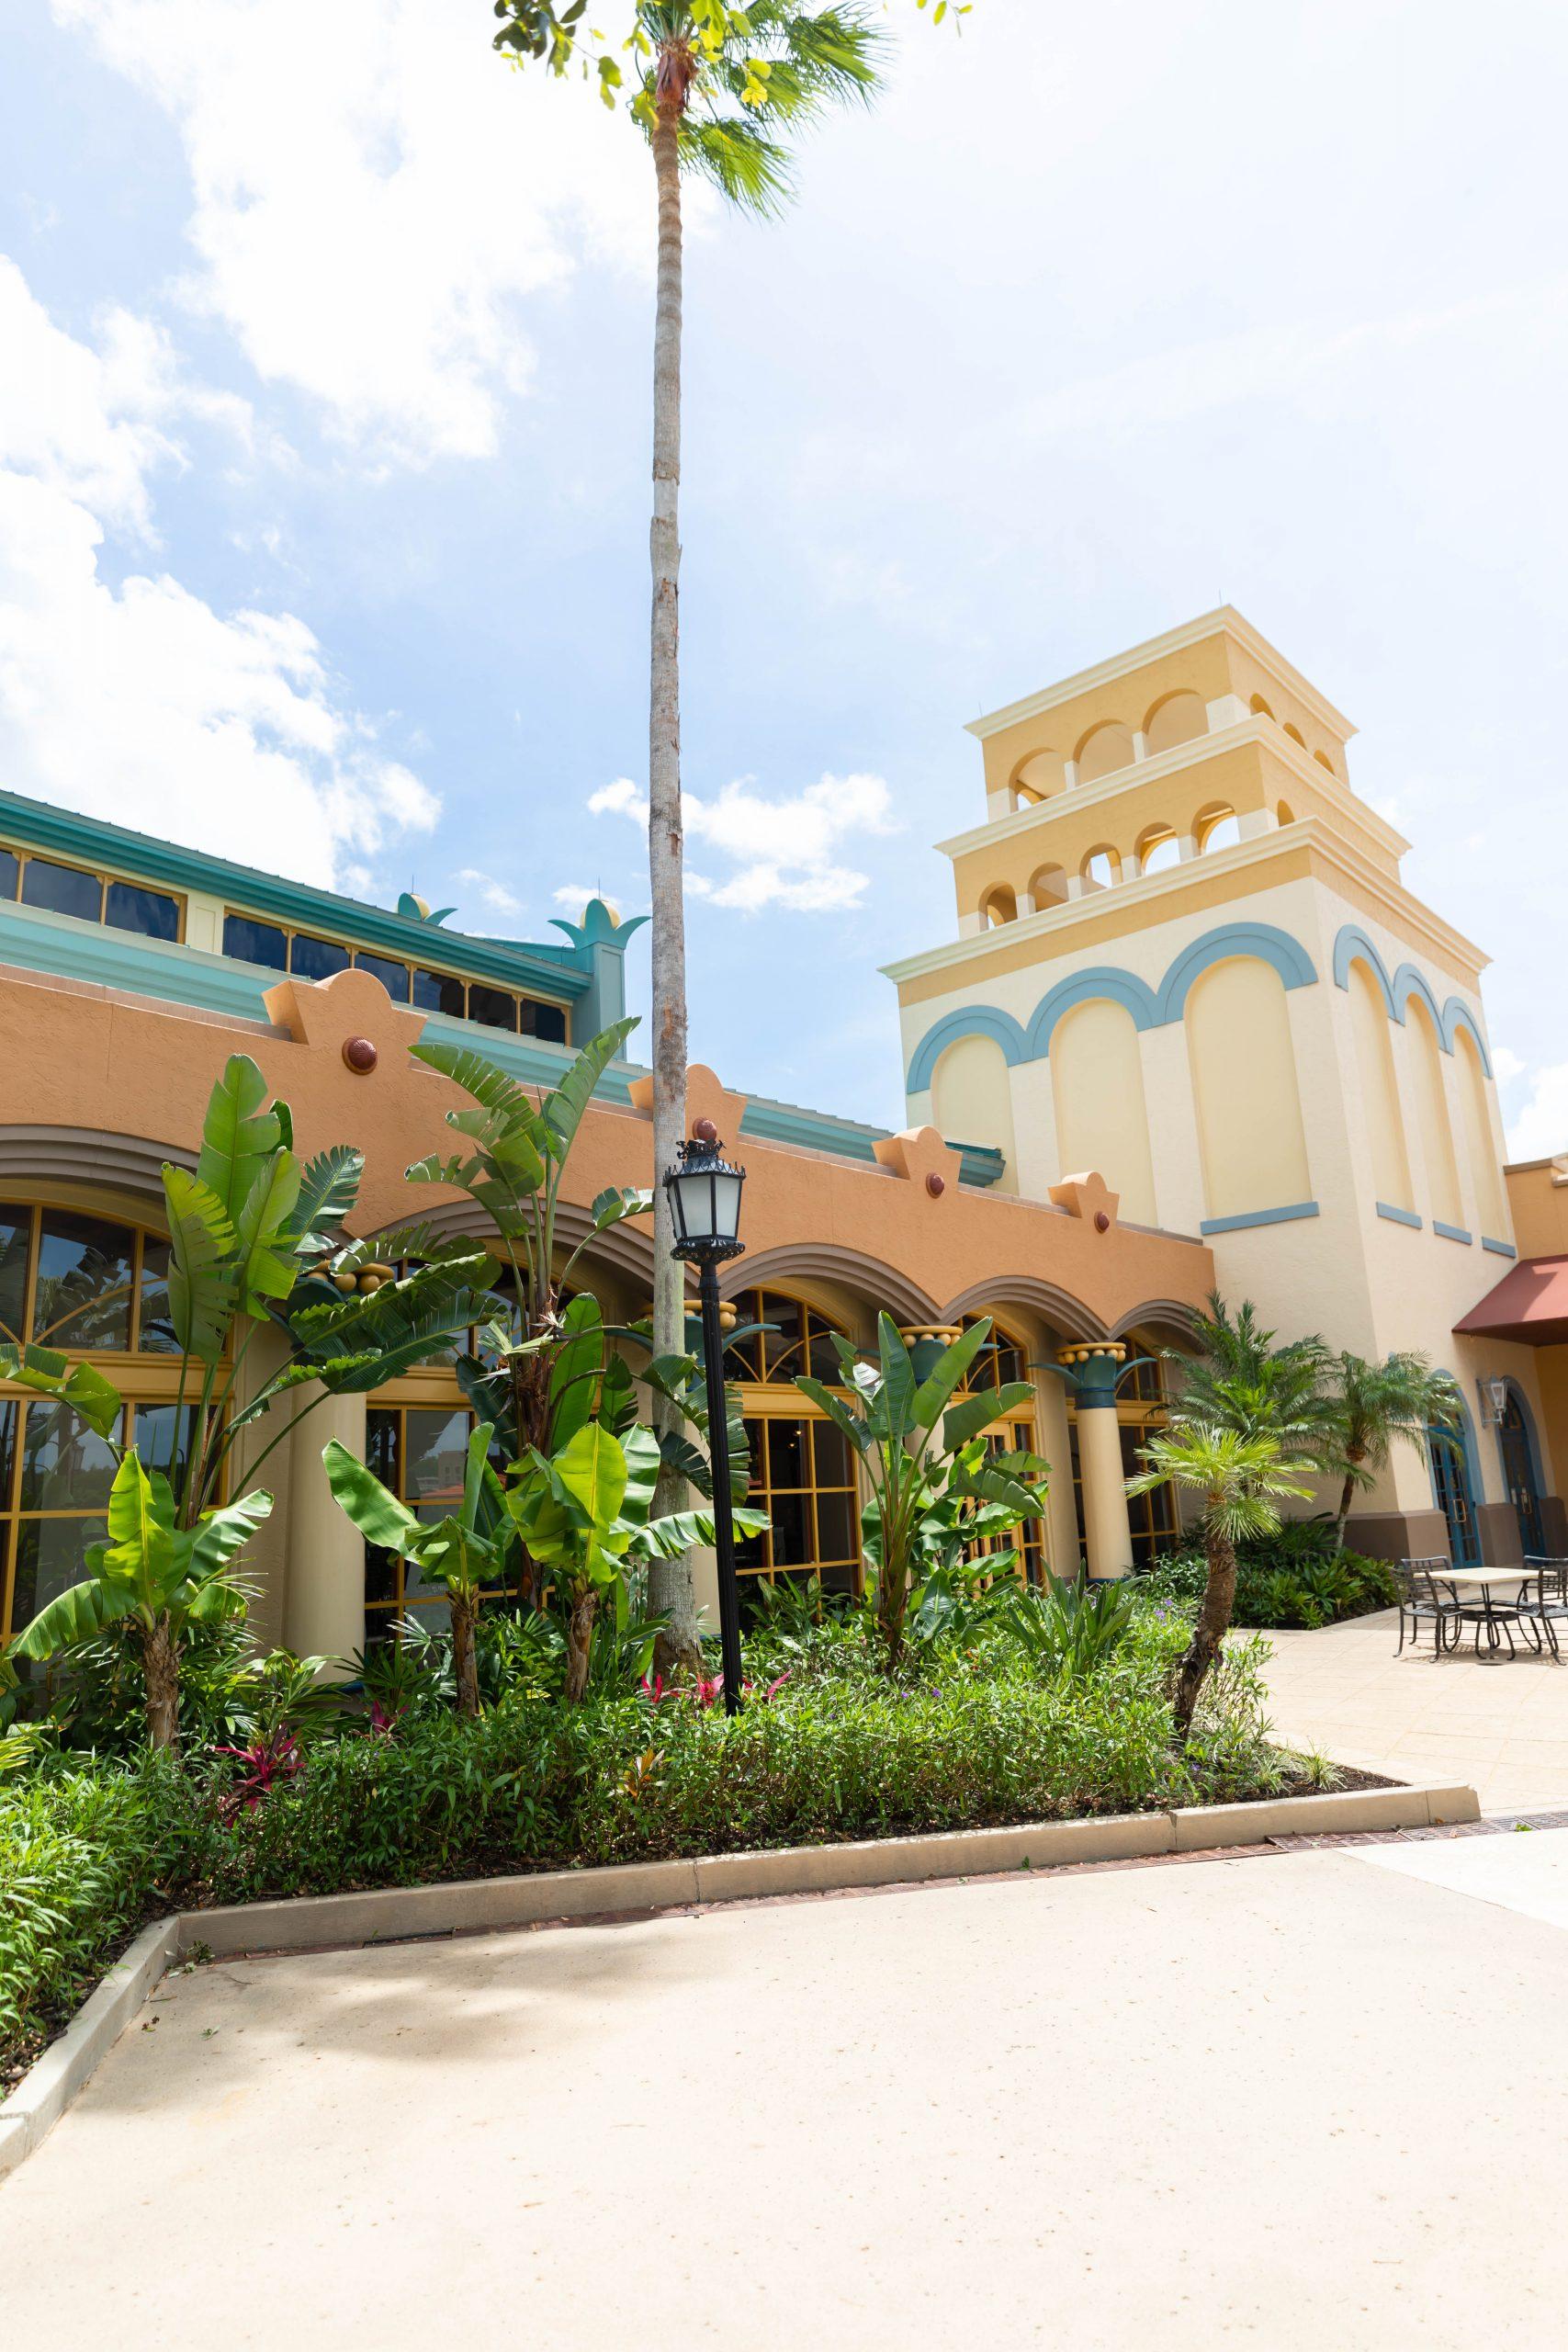 Disney's Coronado Springs Resort Walt Disney World Near Orlando Florida Photographed by Annie Fairfax